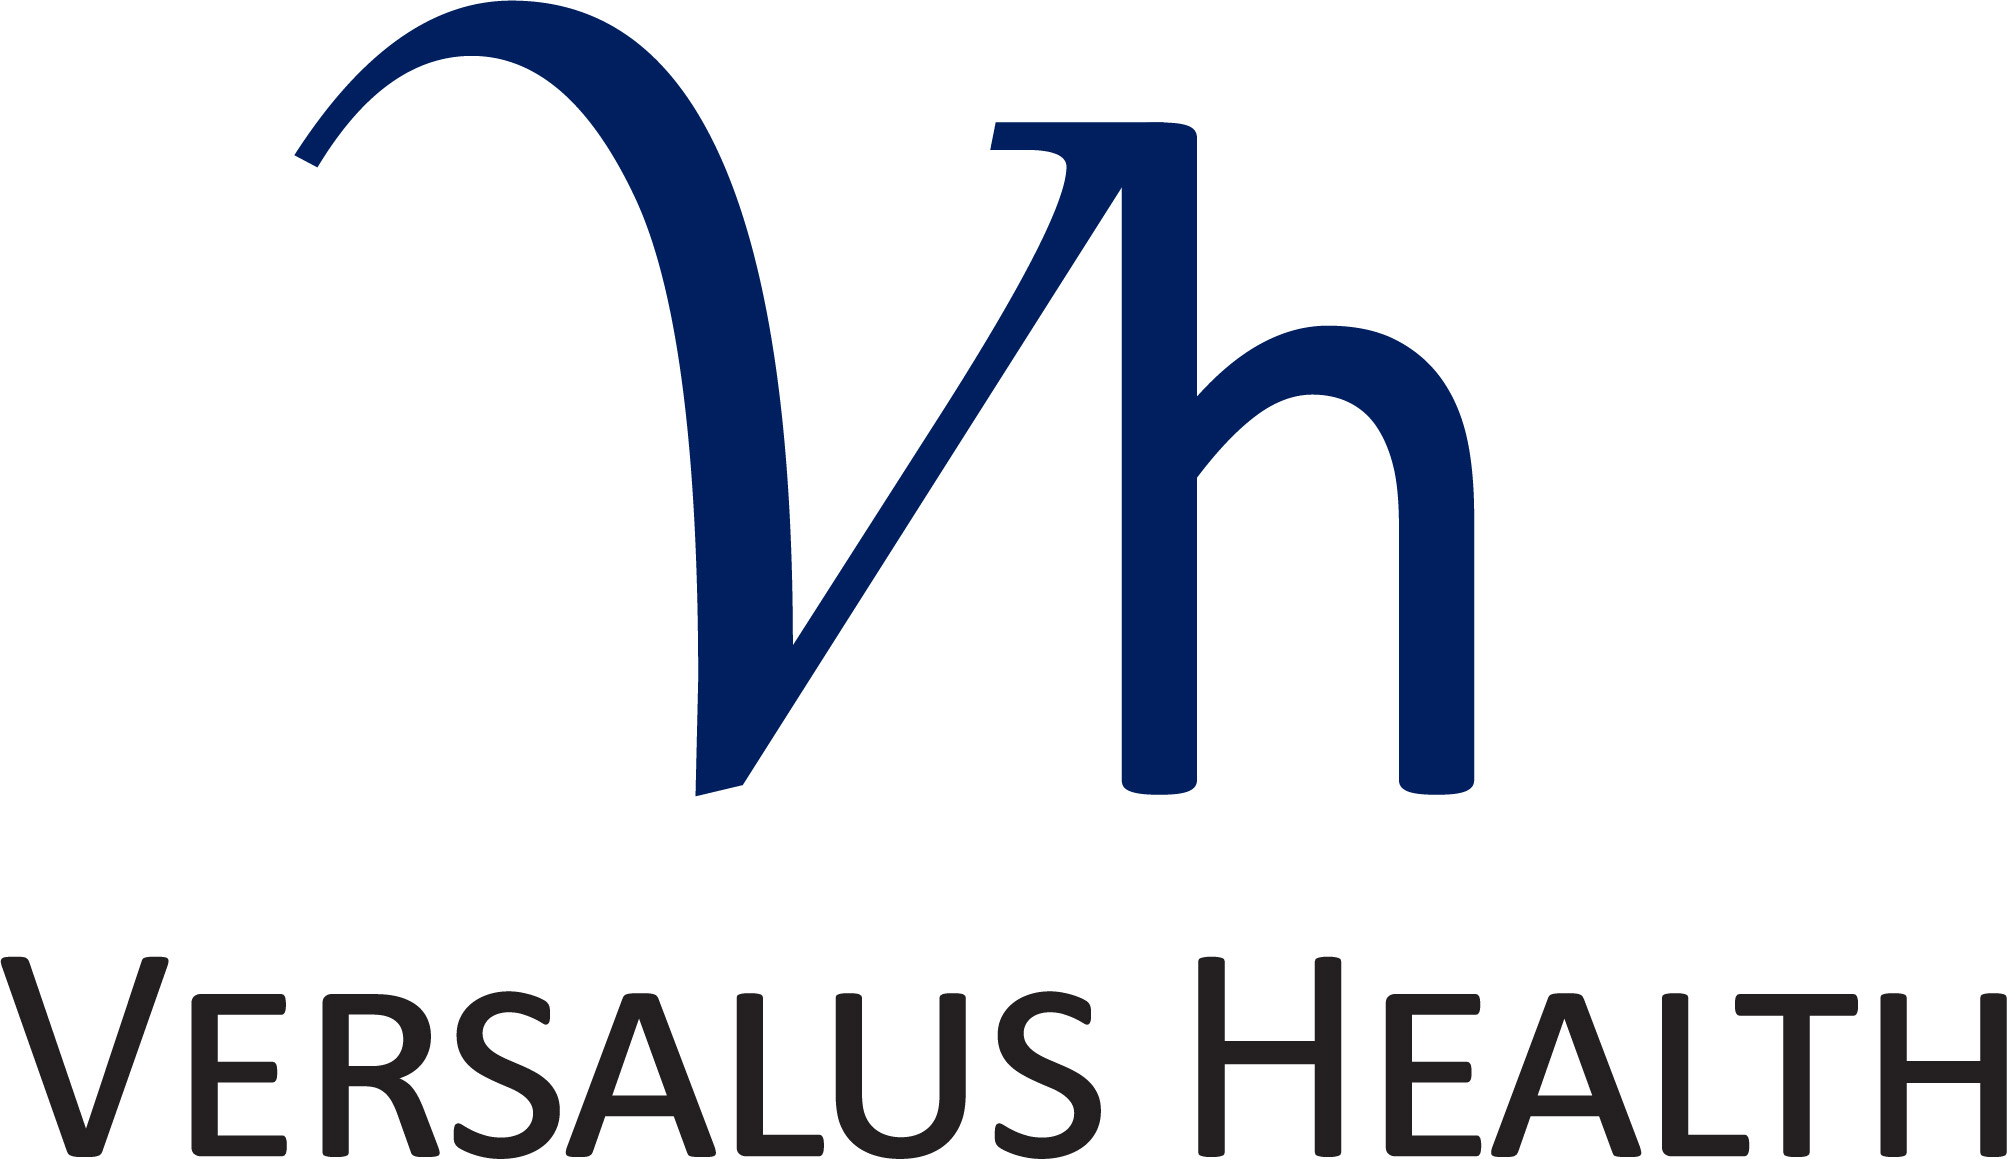 VersalusHealth_Logo_RGB_(002).jpg